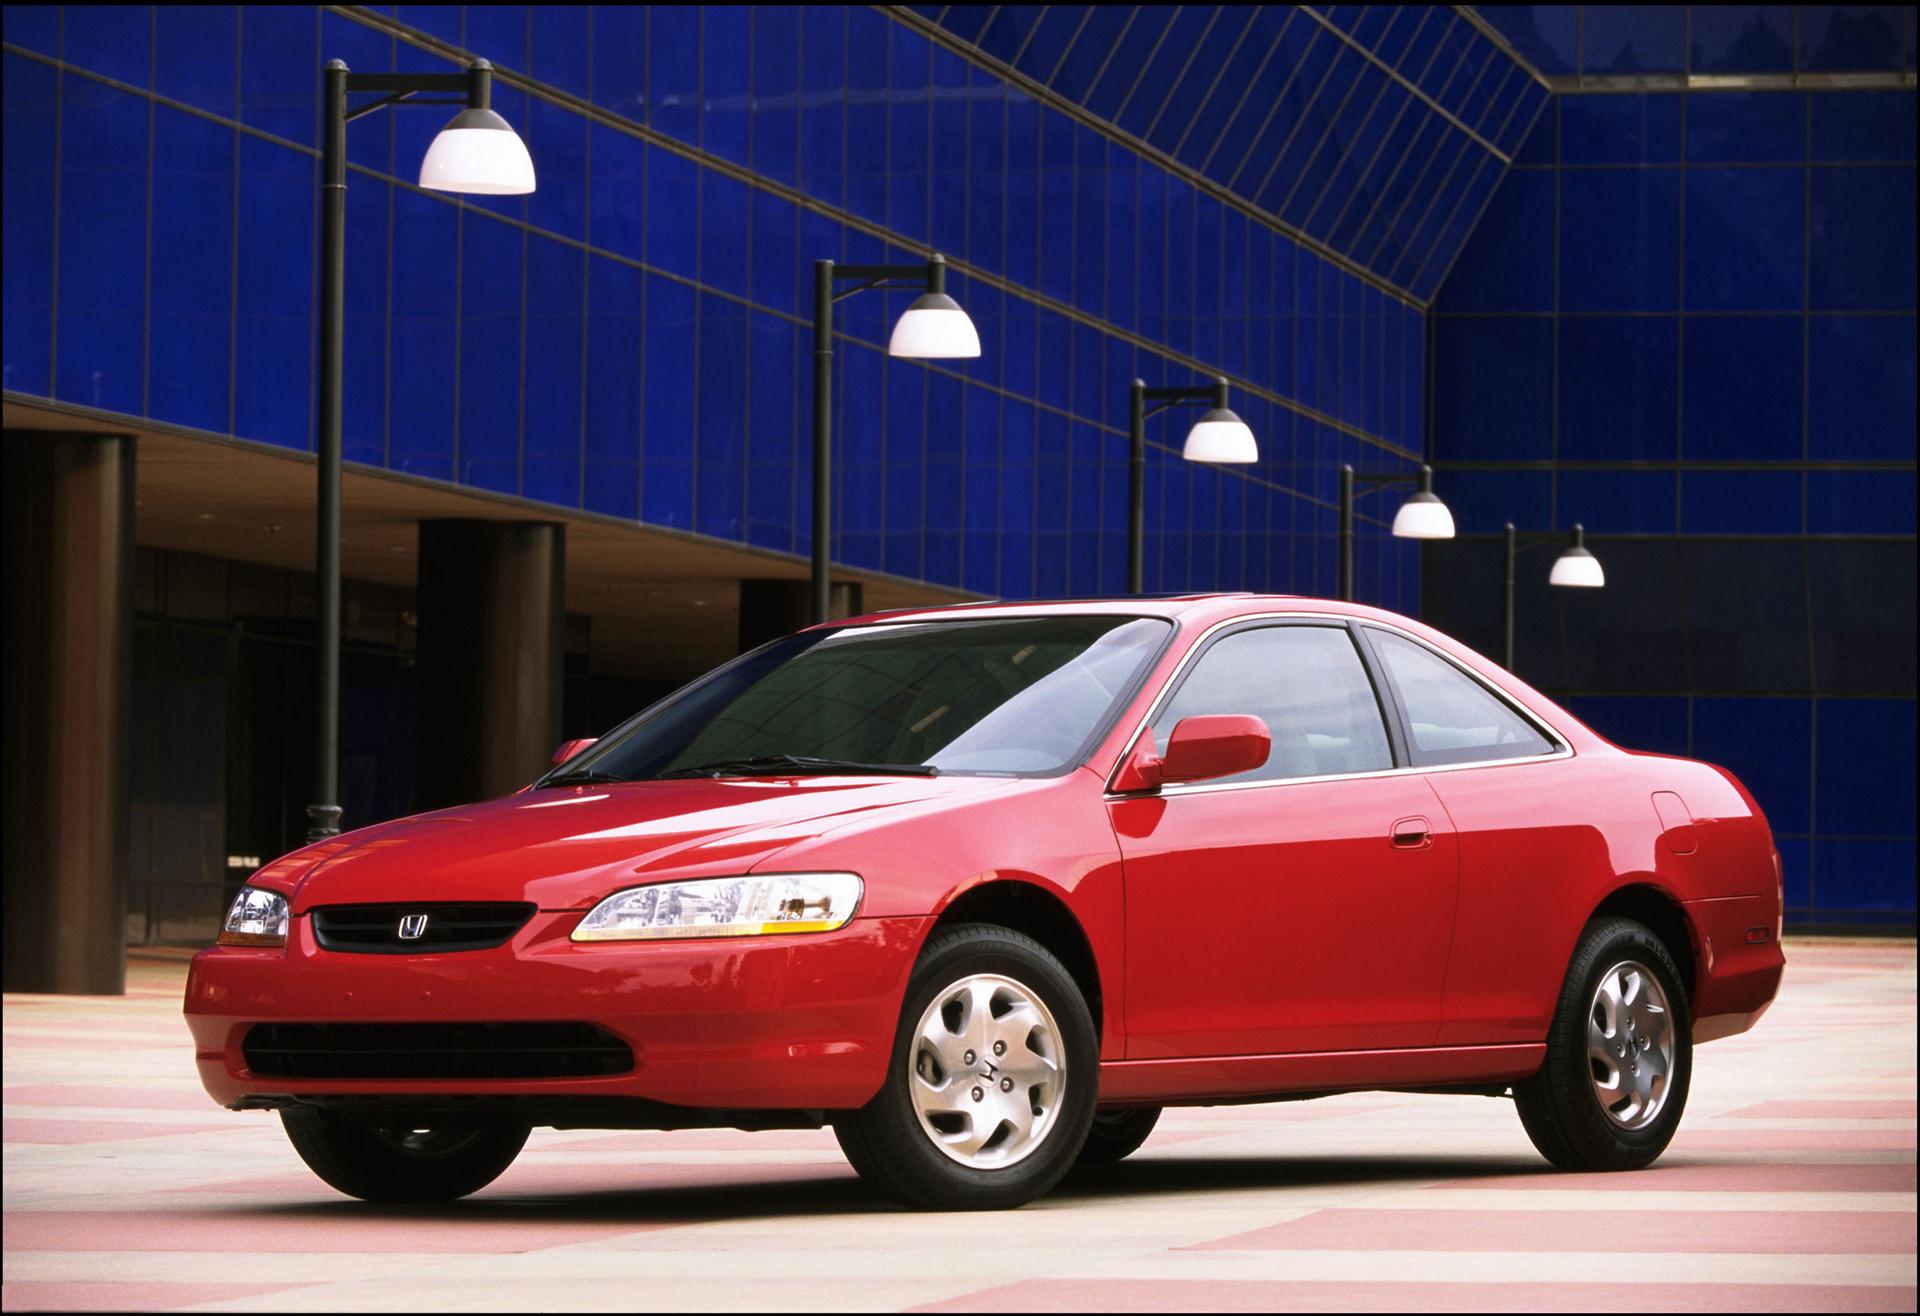 2000 Honda Accord EX © Honda Motor Co., Ltd.